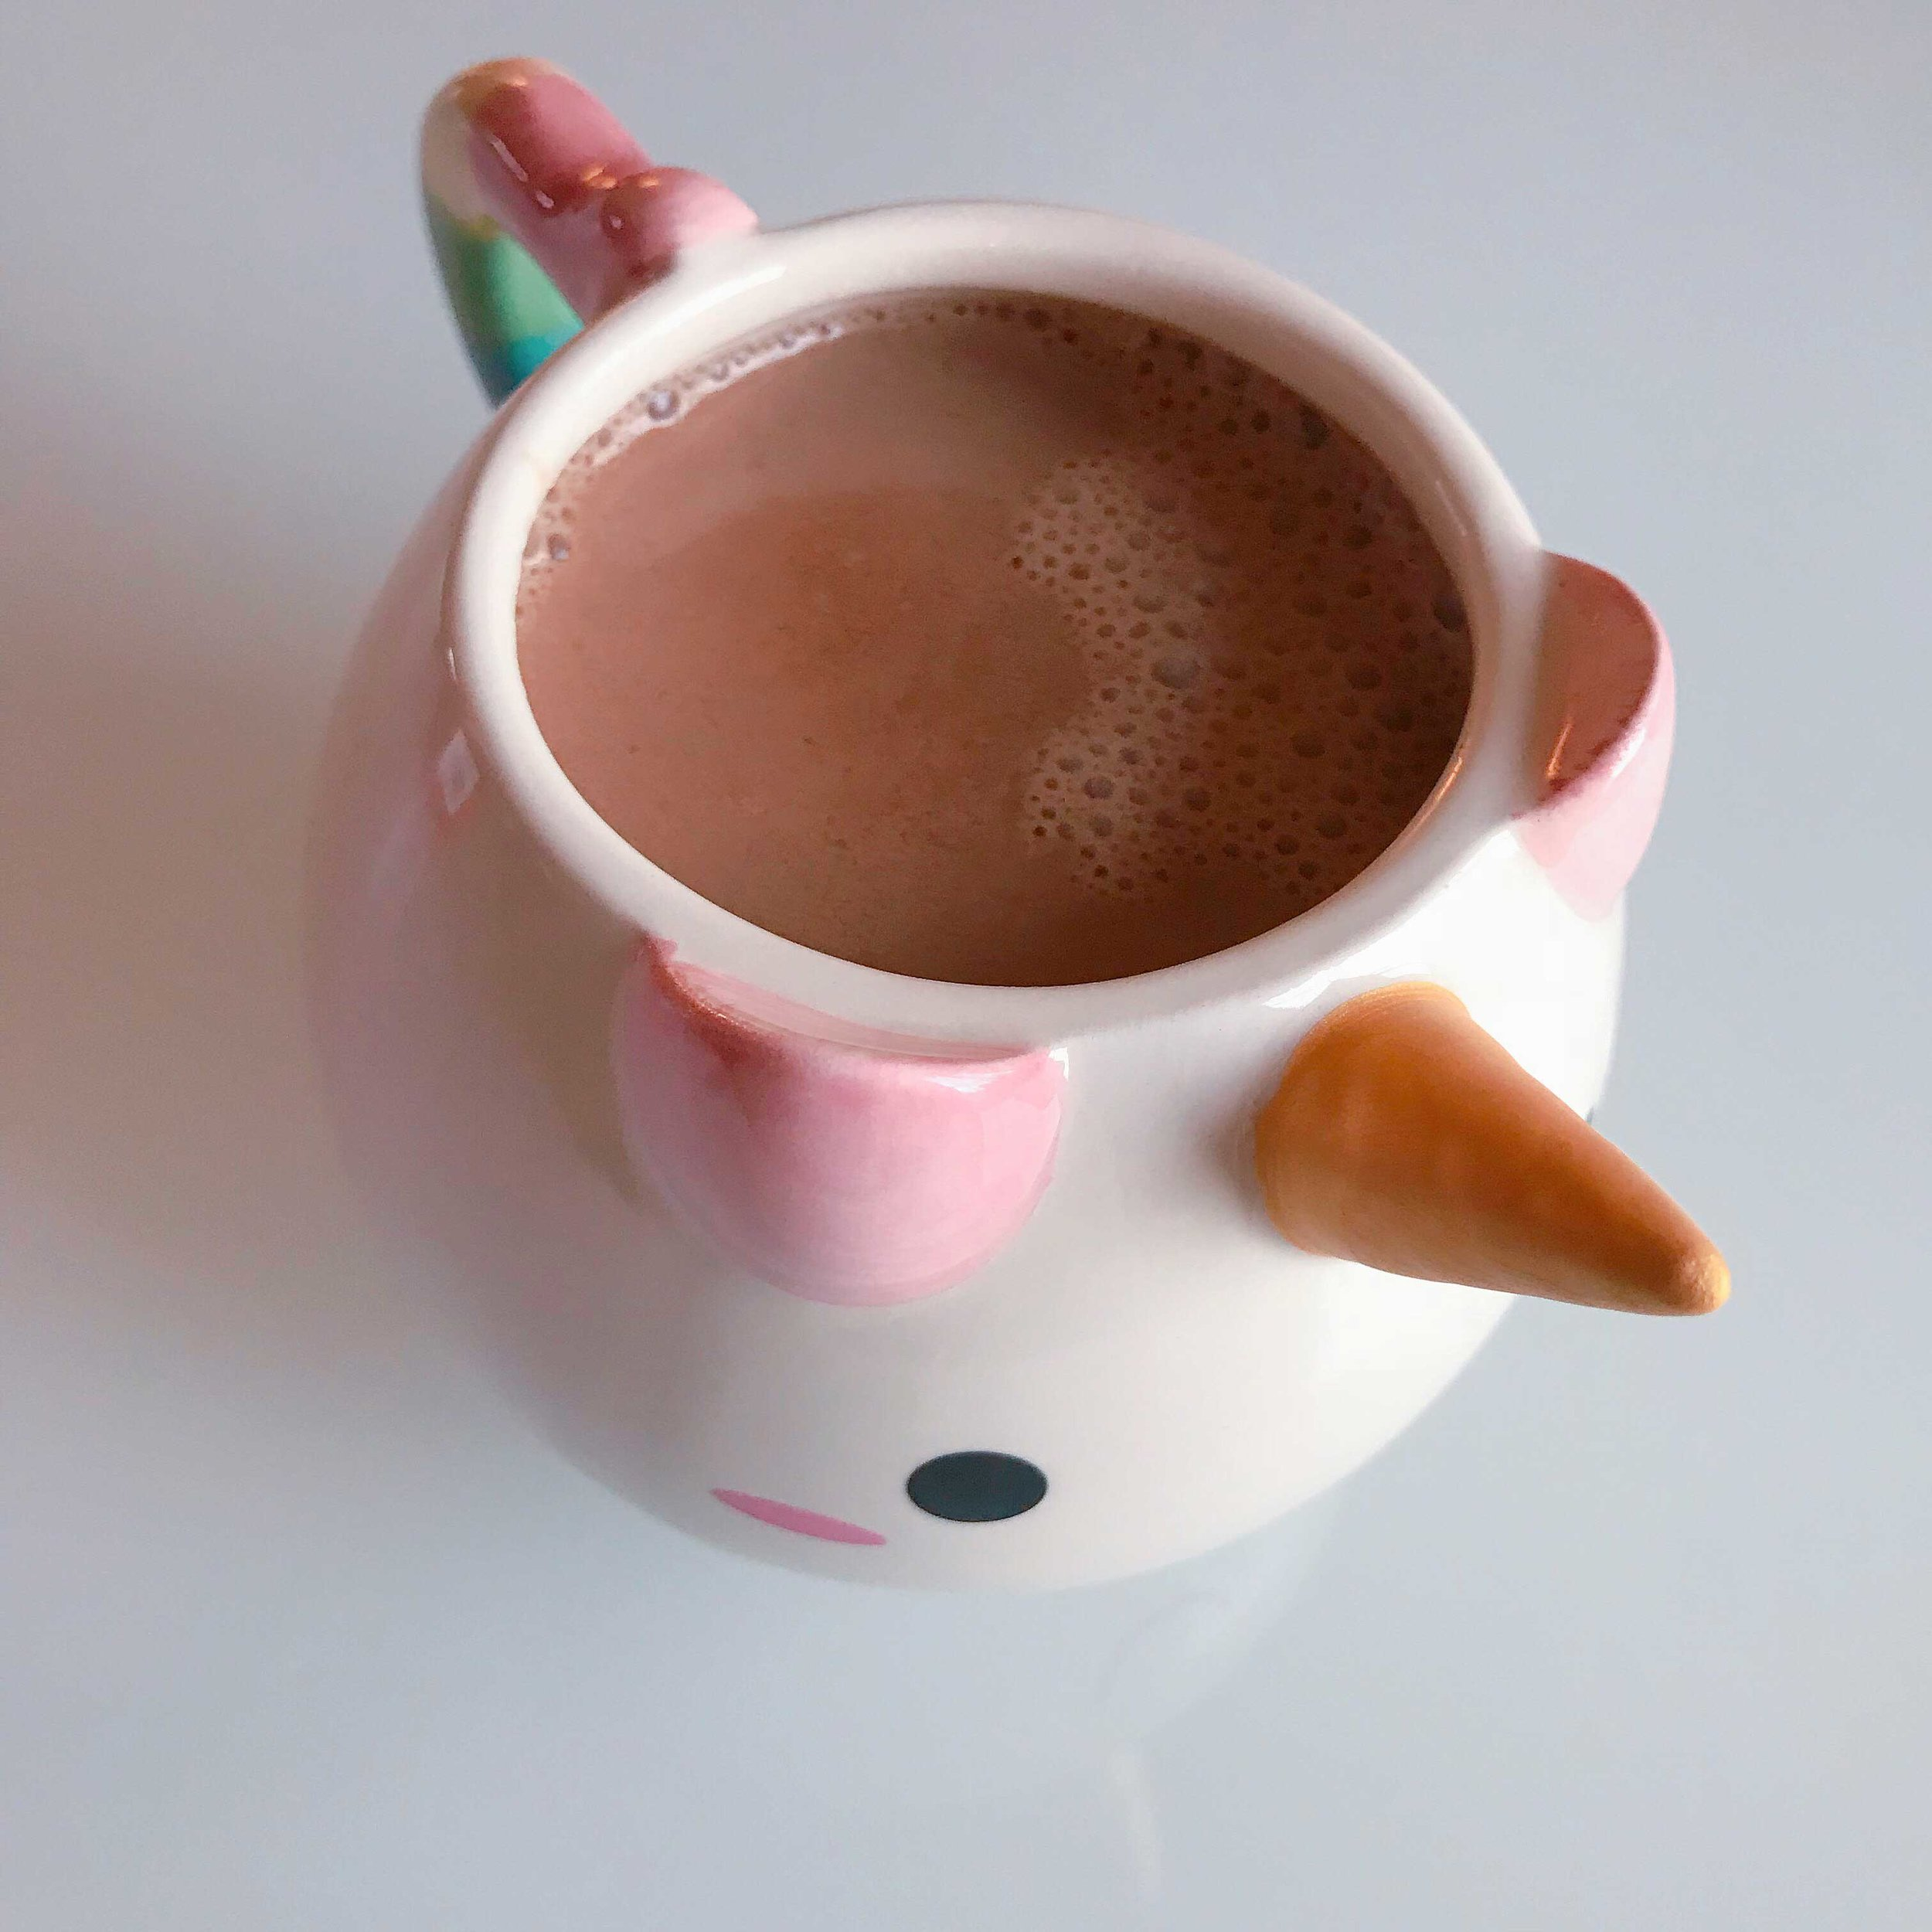 ashly-locklin-healthy-hot-chocolate-unicorn-mug-2.jpg